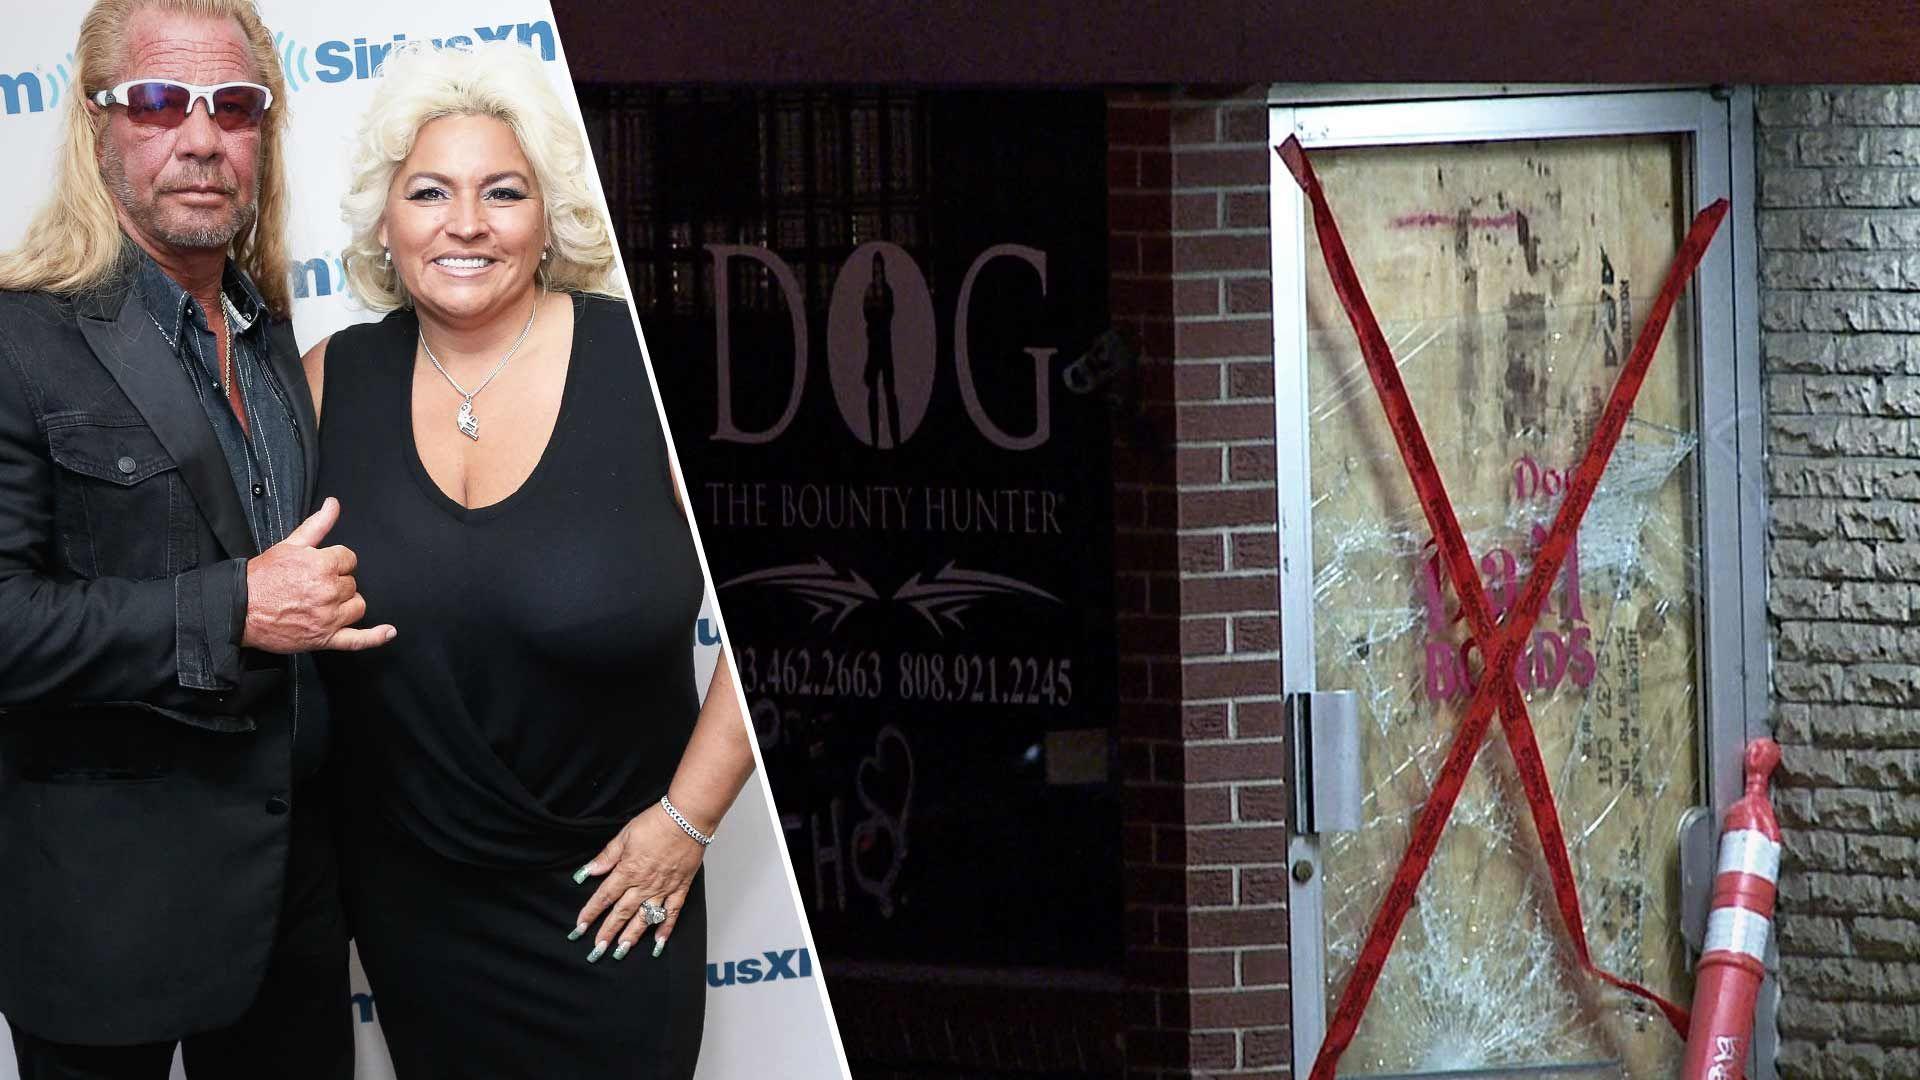 Dog The Bounty Hunters Colorado Store Burglarized Beths